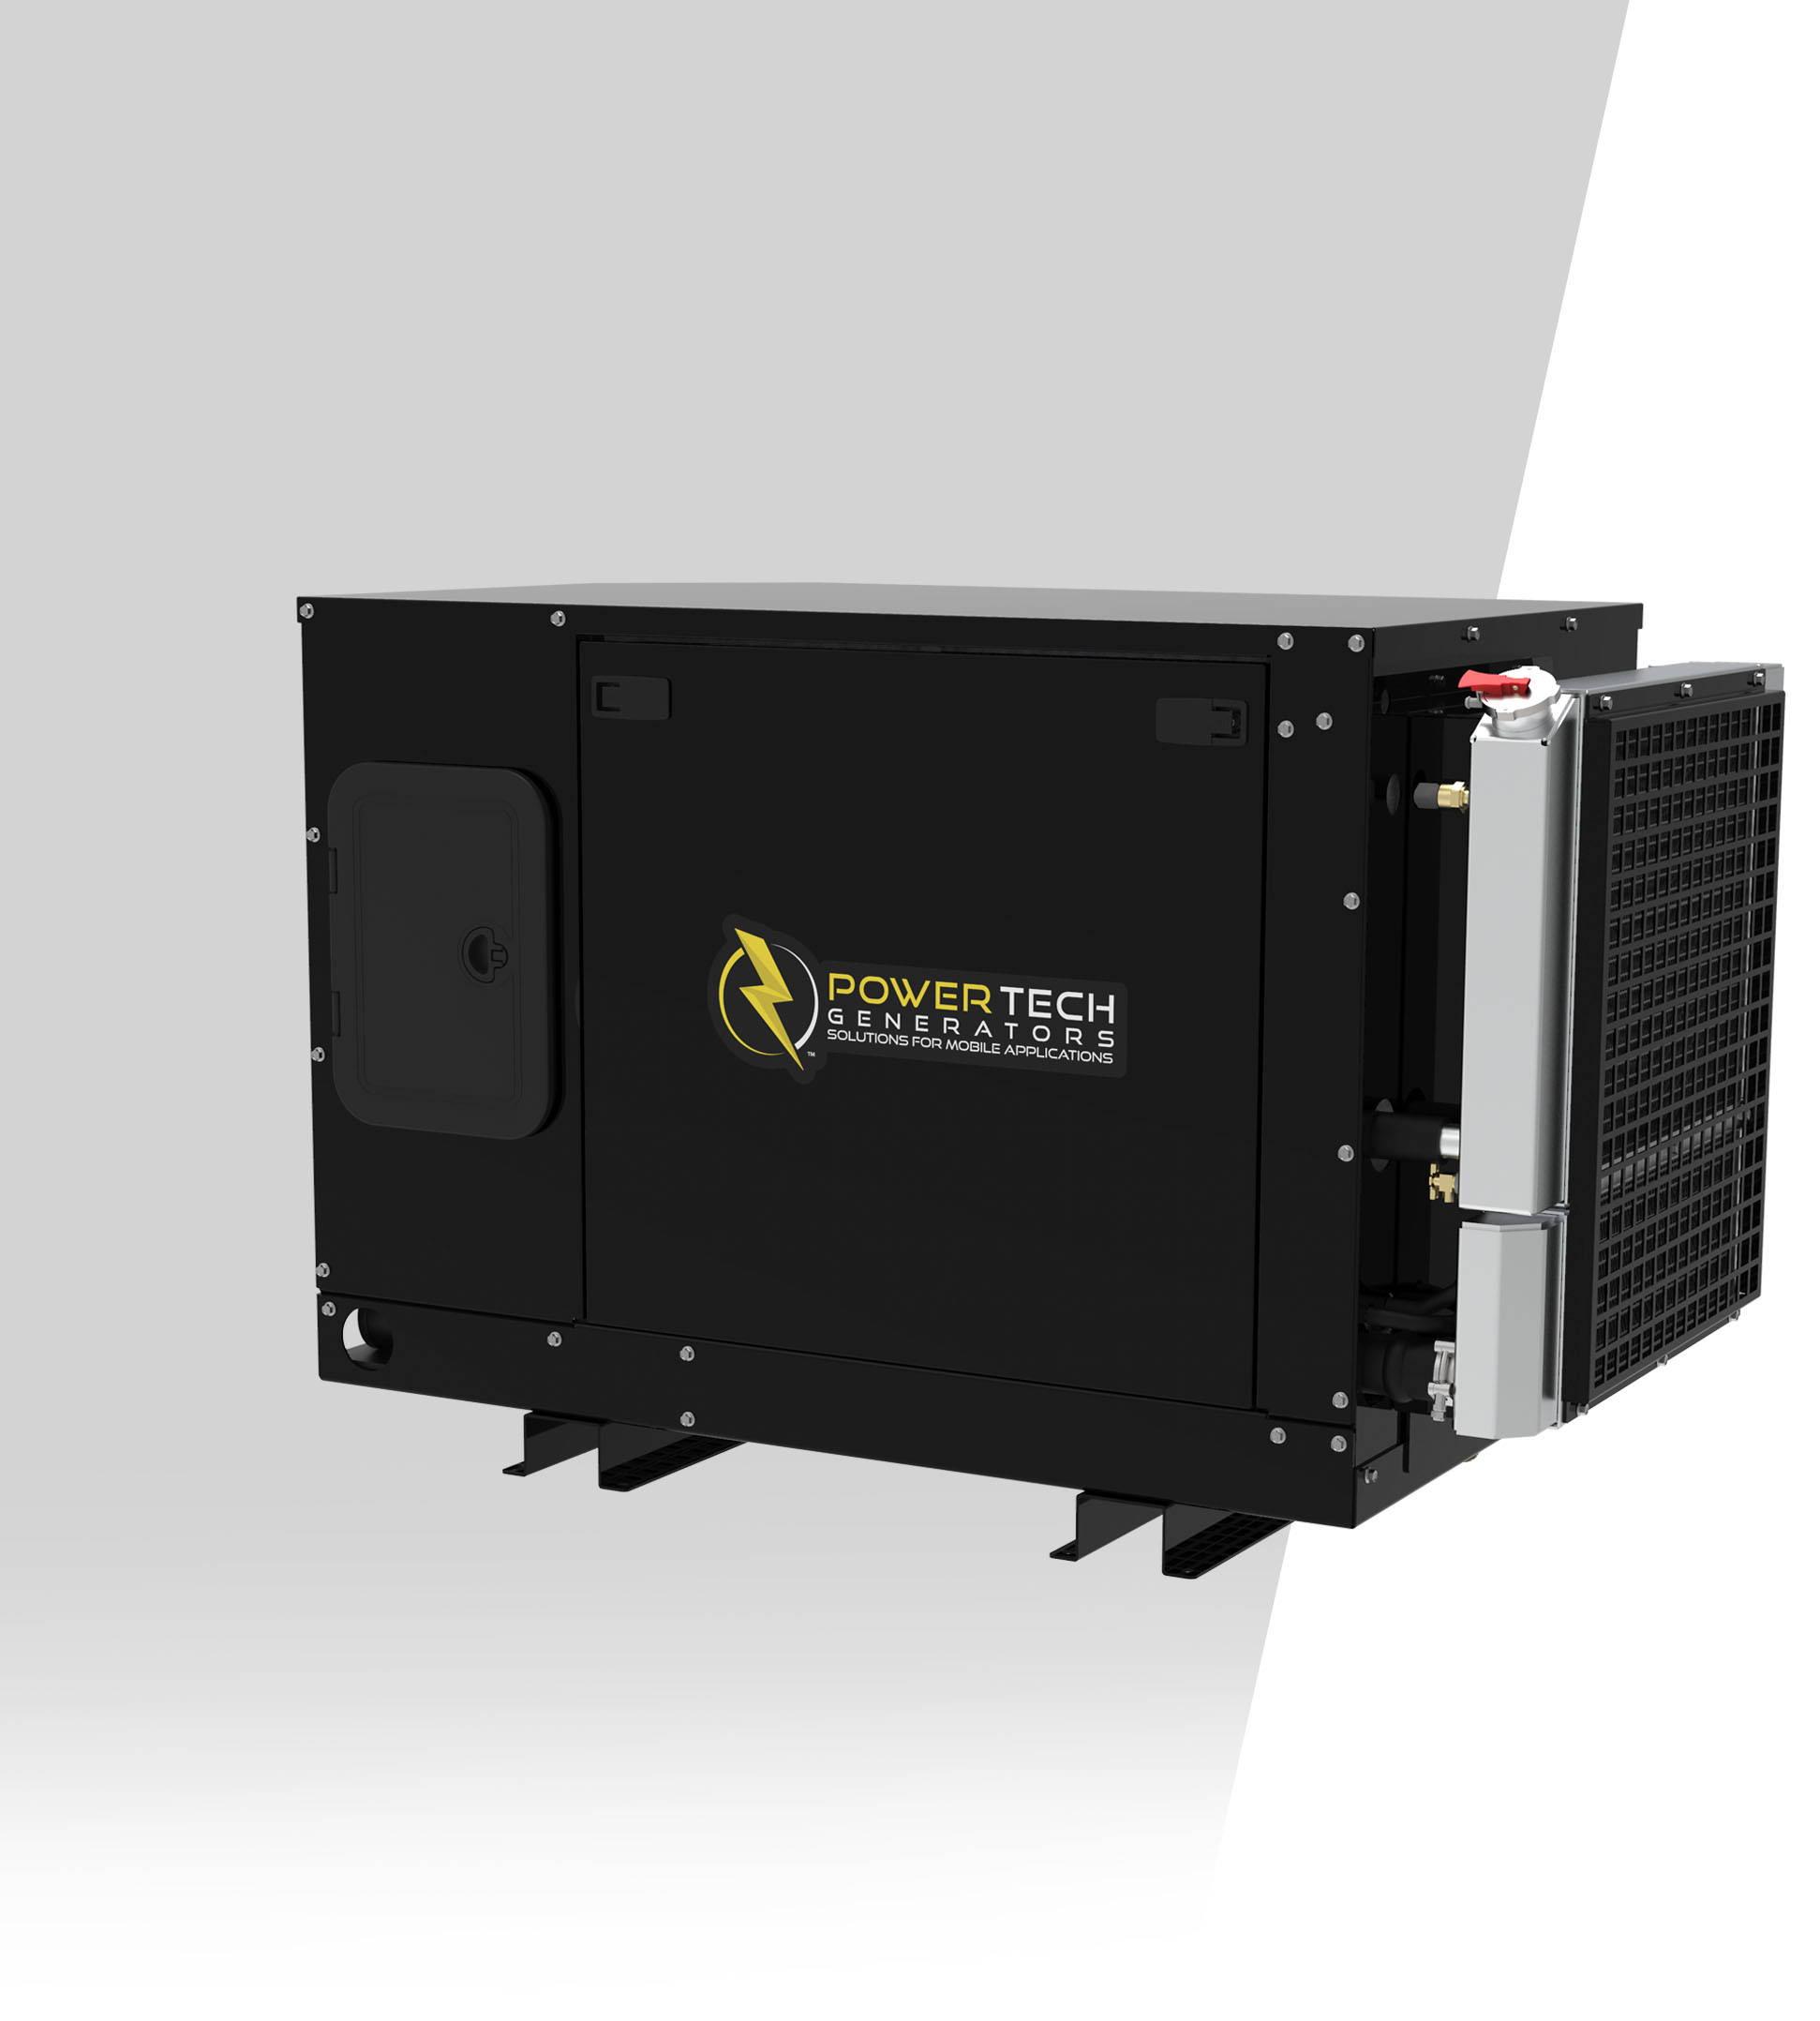 Power Tech Mobile Medical Generator